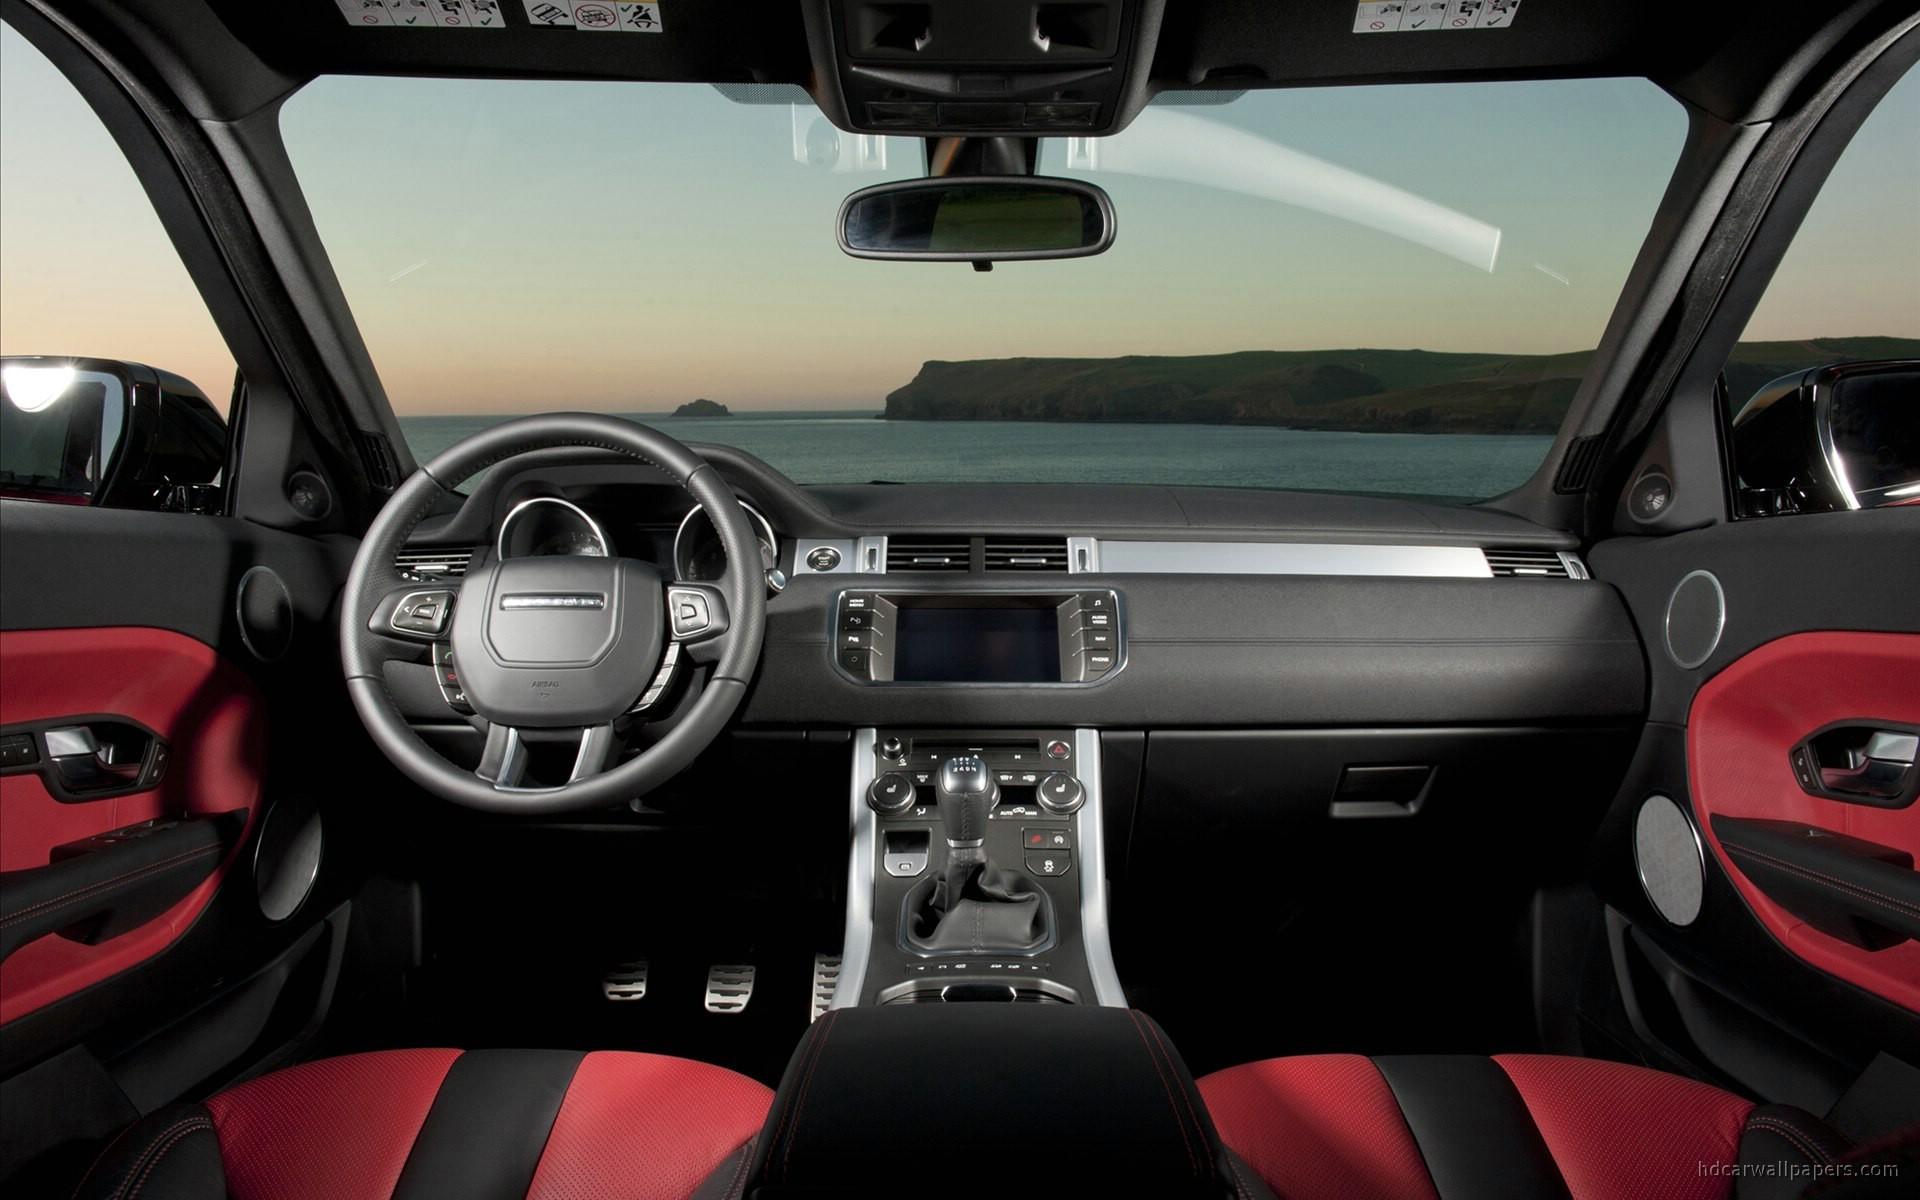 Iphone X Dynamic Wallpaper Download Range Rover Evoque 5 Door Interior Wallpaper Hd Car